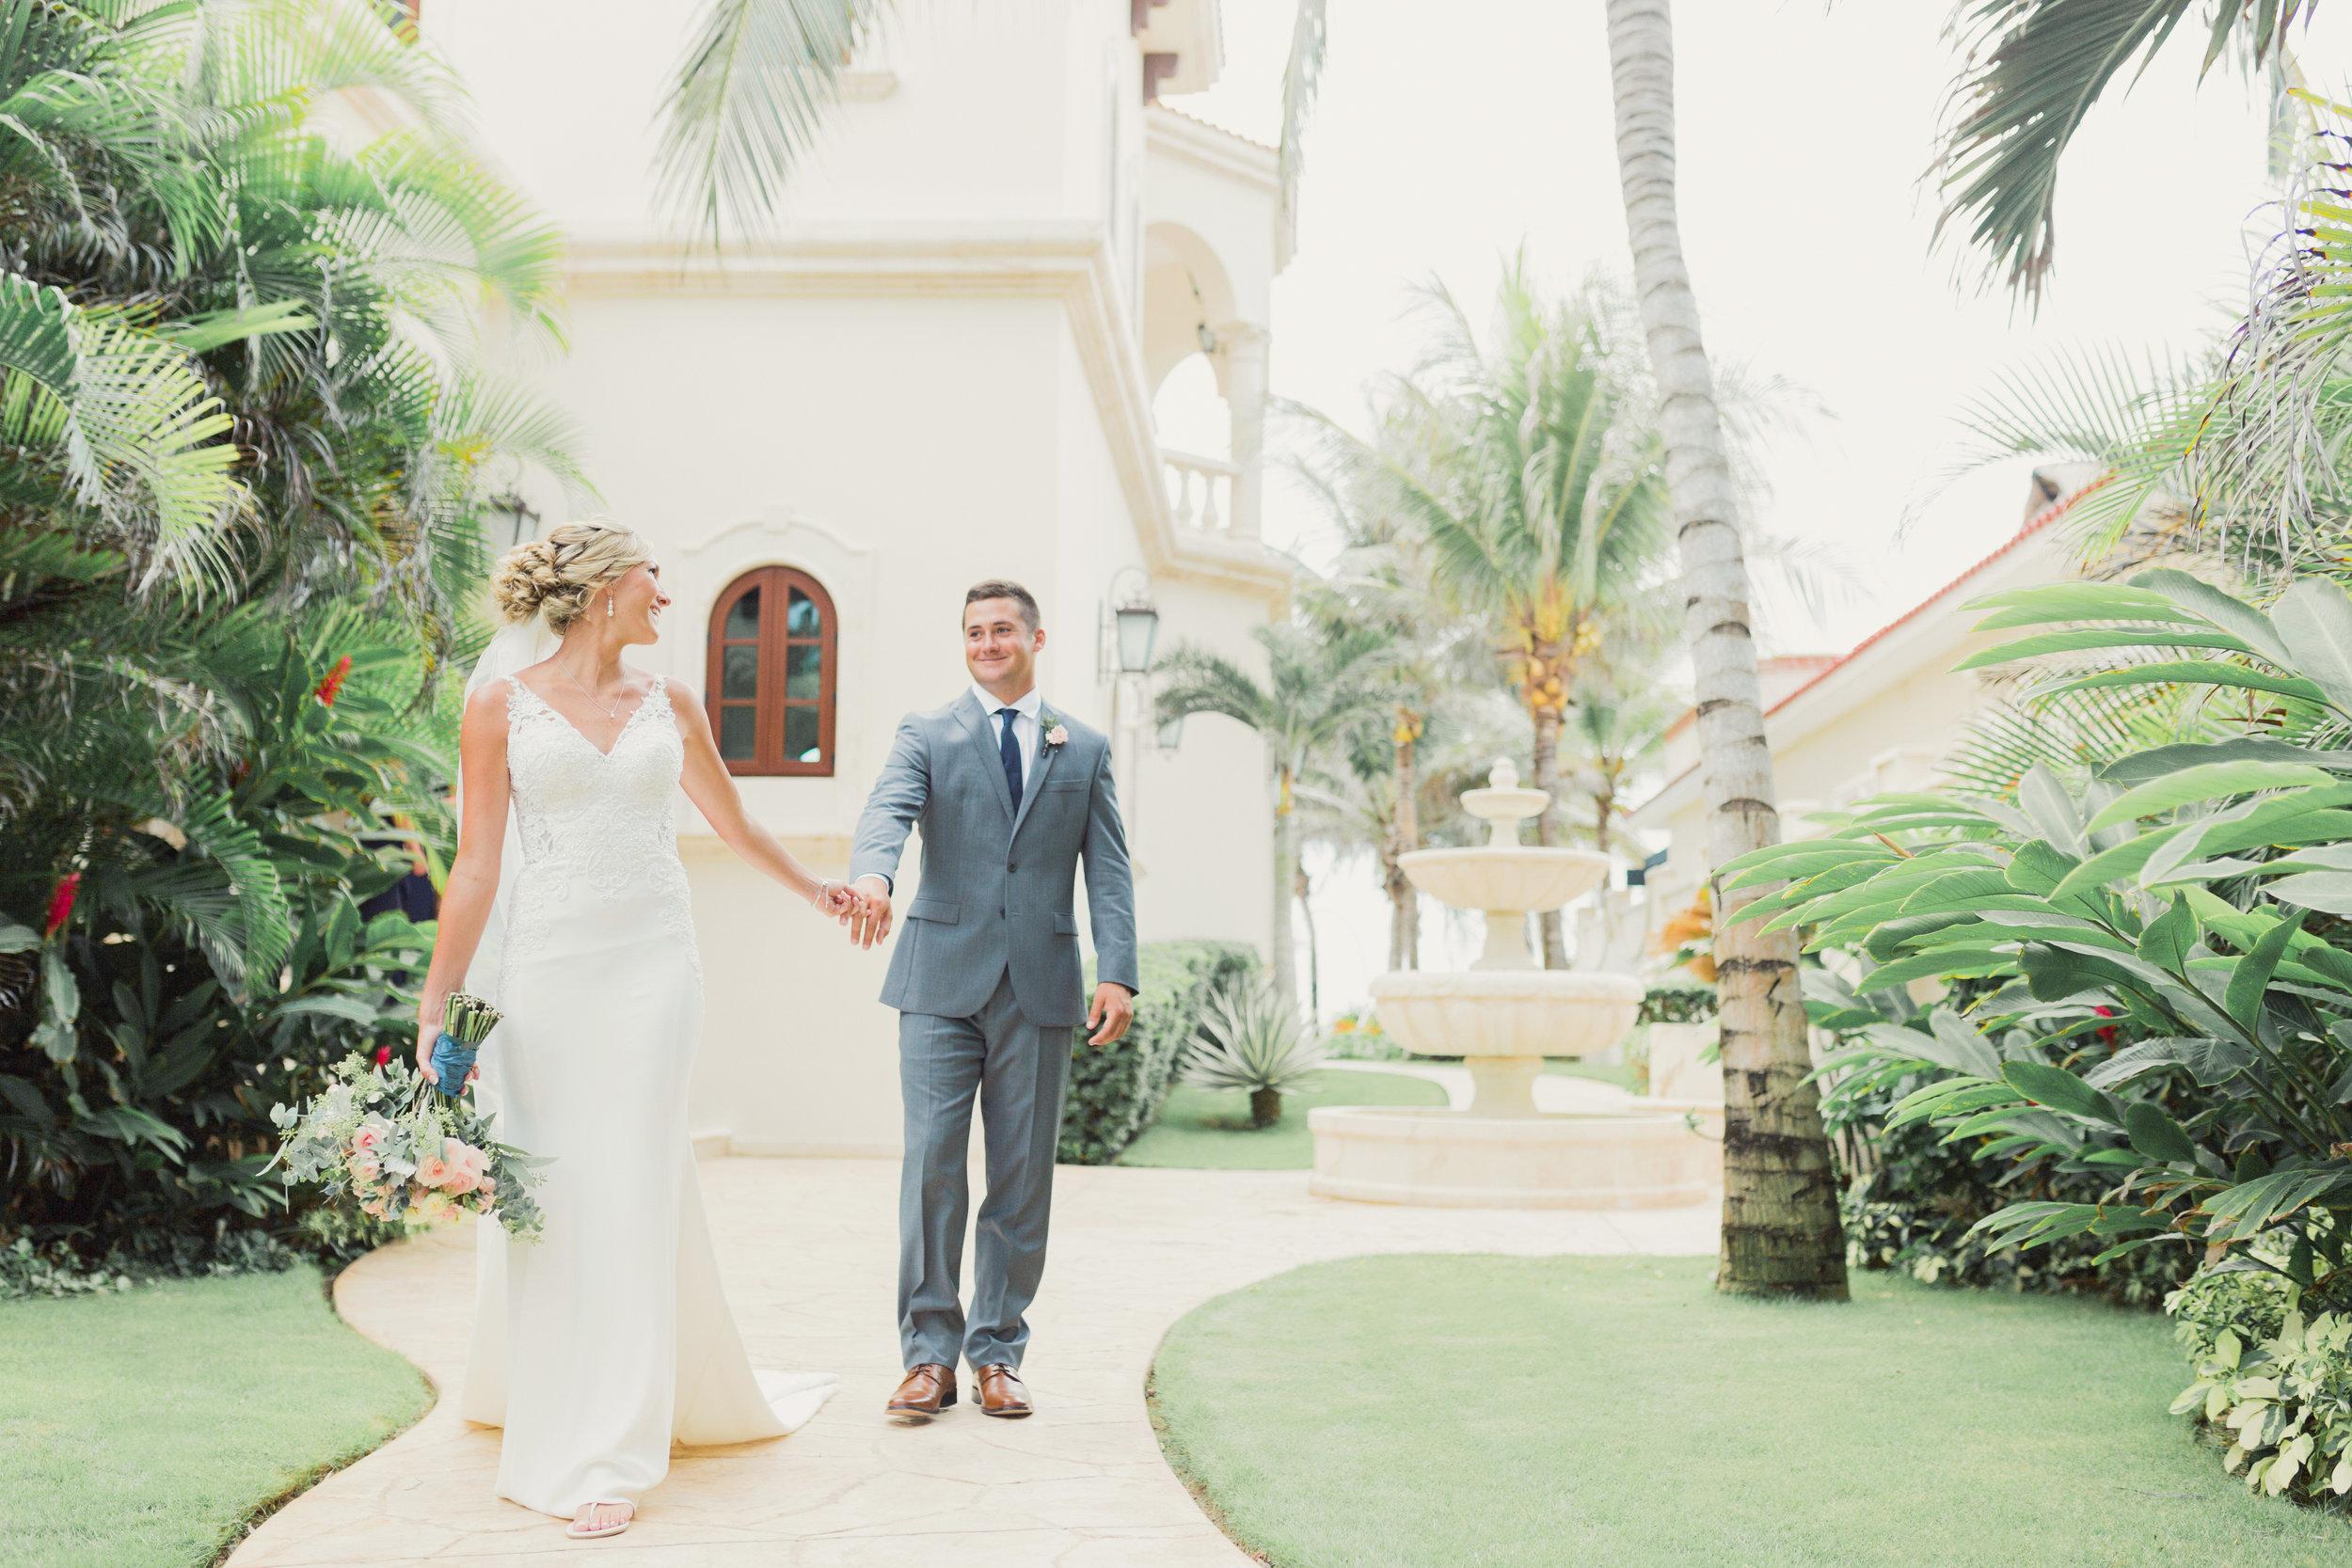 cancun-wedding-venue-villa-la-joya-66.jpg